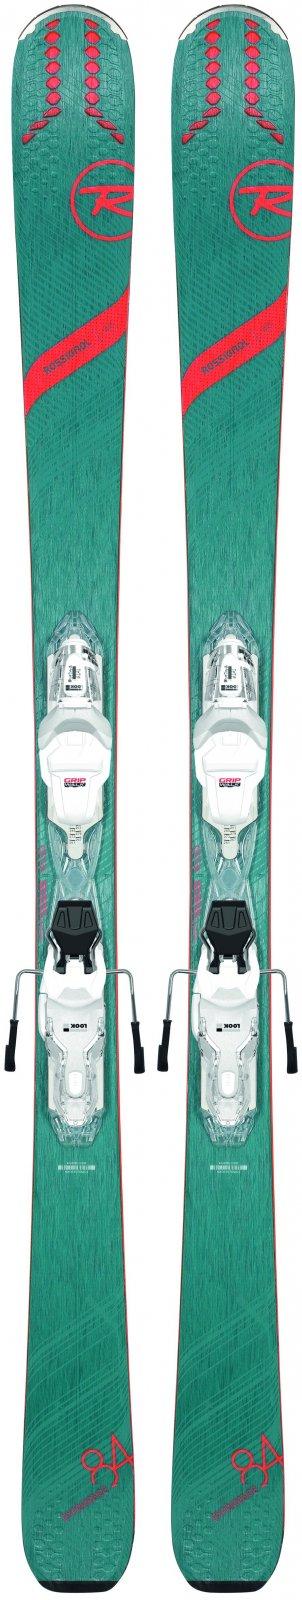 Rossignol Experience 84 Ai W Skis + Look Xpress 11 W GW Bindings 2020